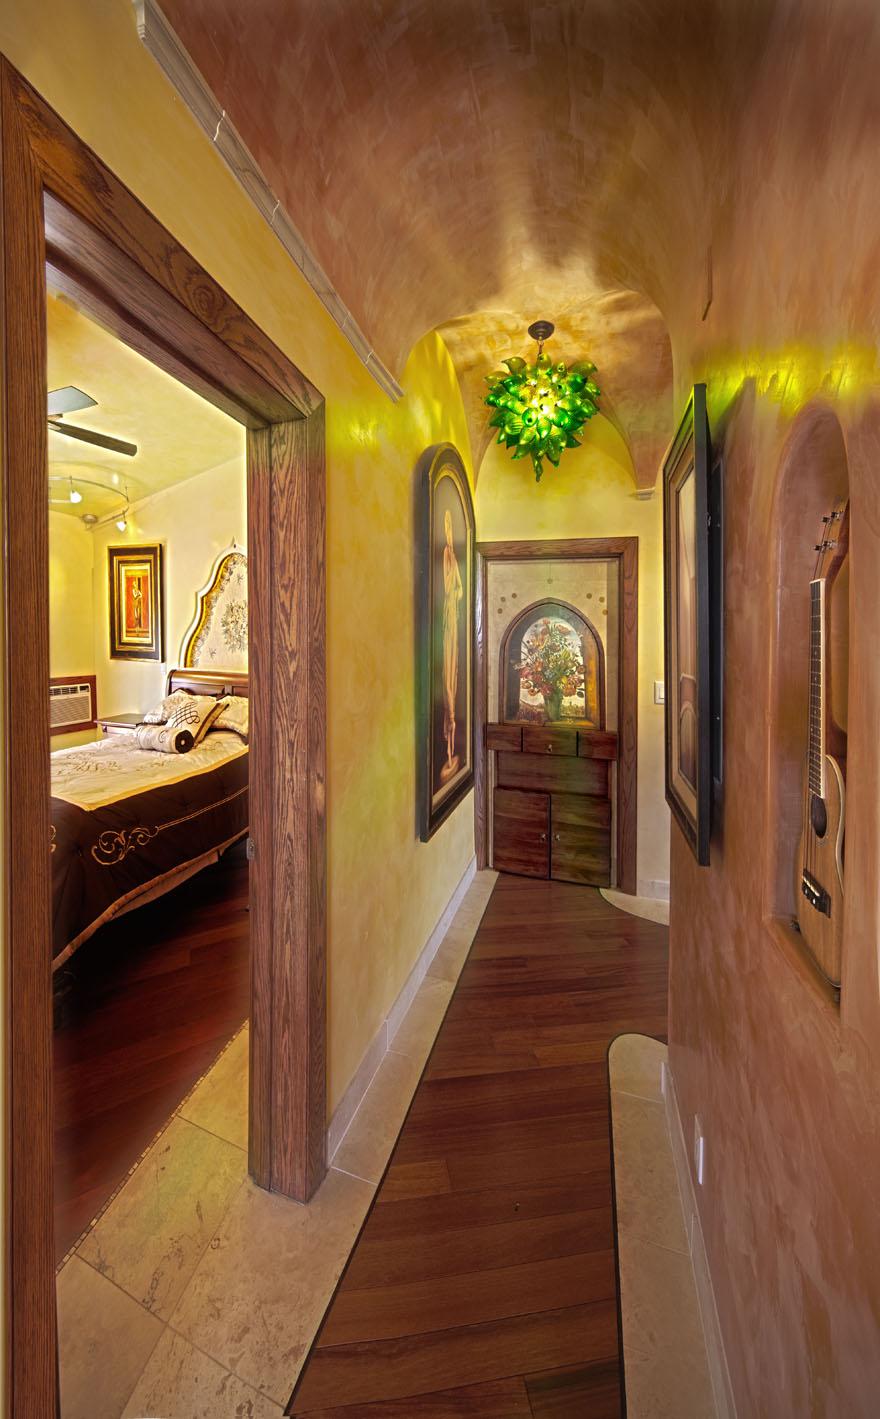 Ceiling Chandelier tata corridor rick strini .jpg